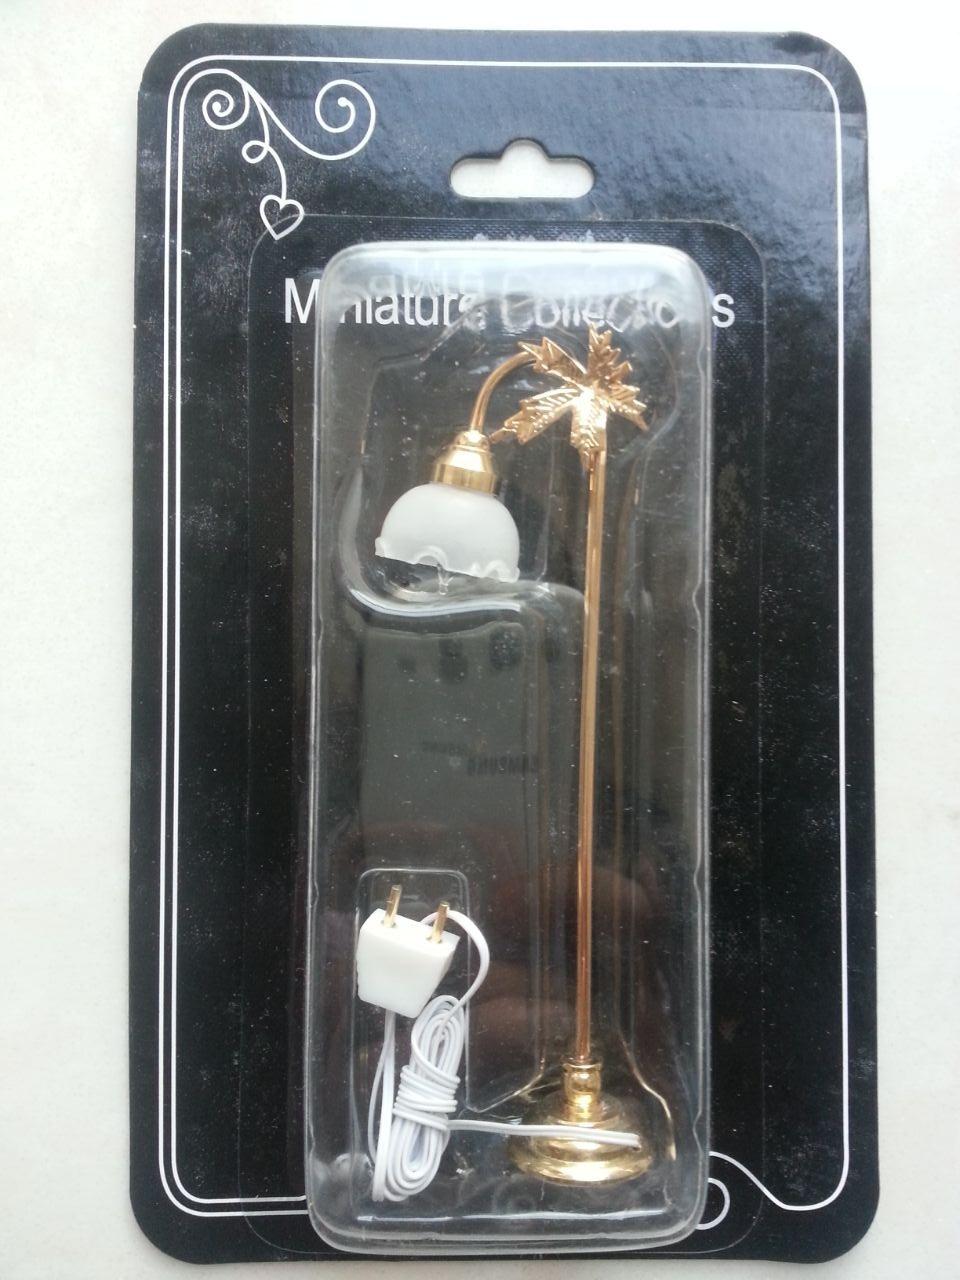 Miniaturas 1 12 Dollhouse Miniature Self control W battery Gold Leaf LED Floor Lamp Light